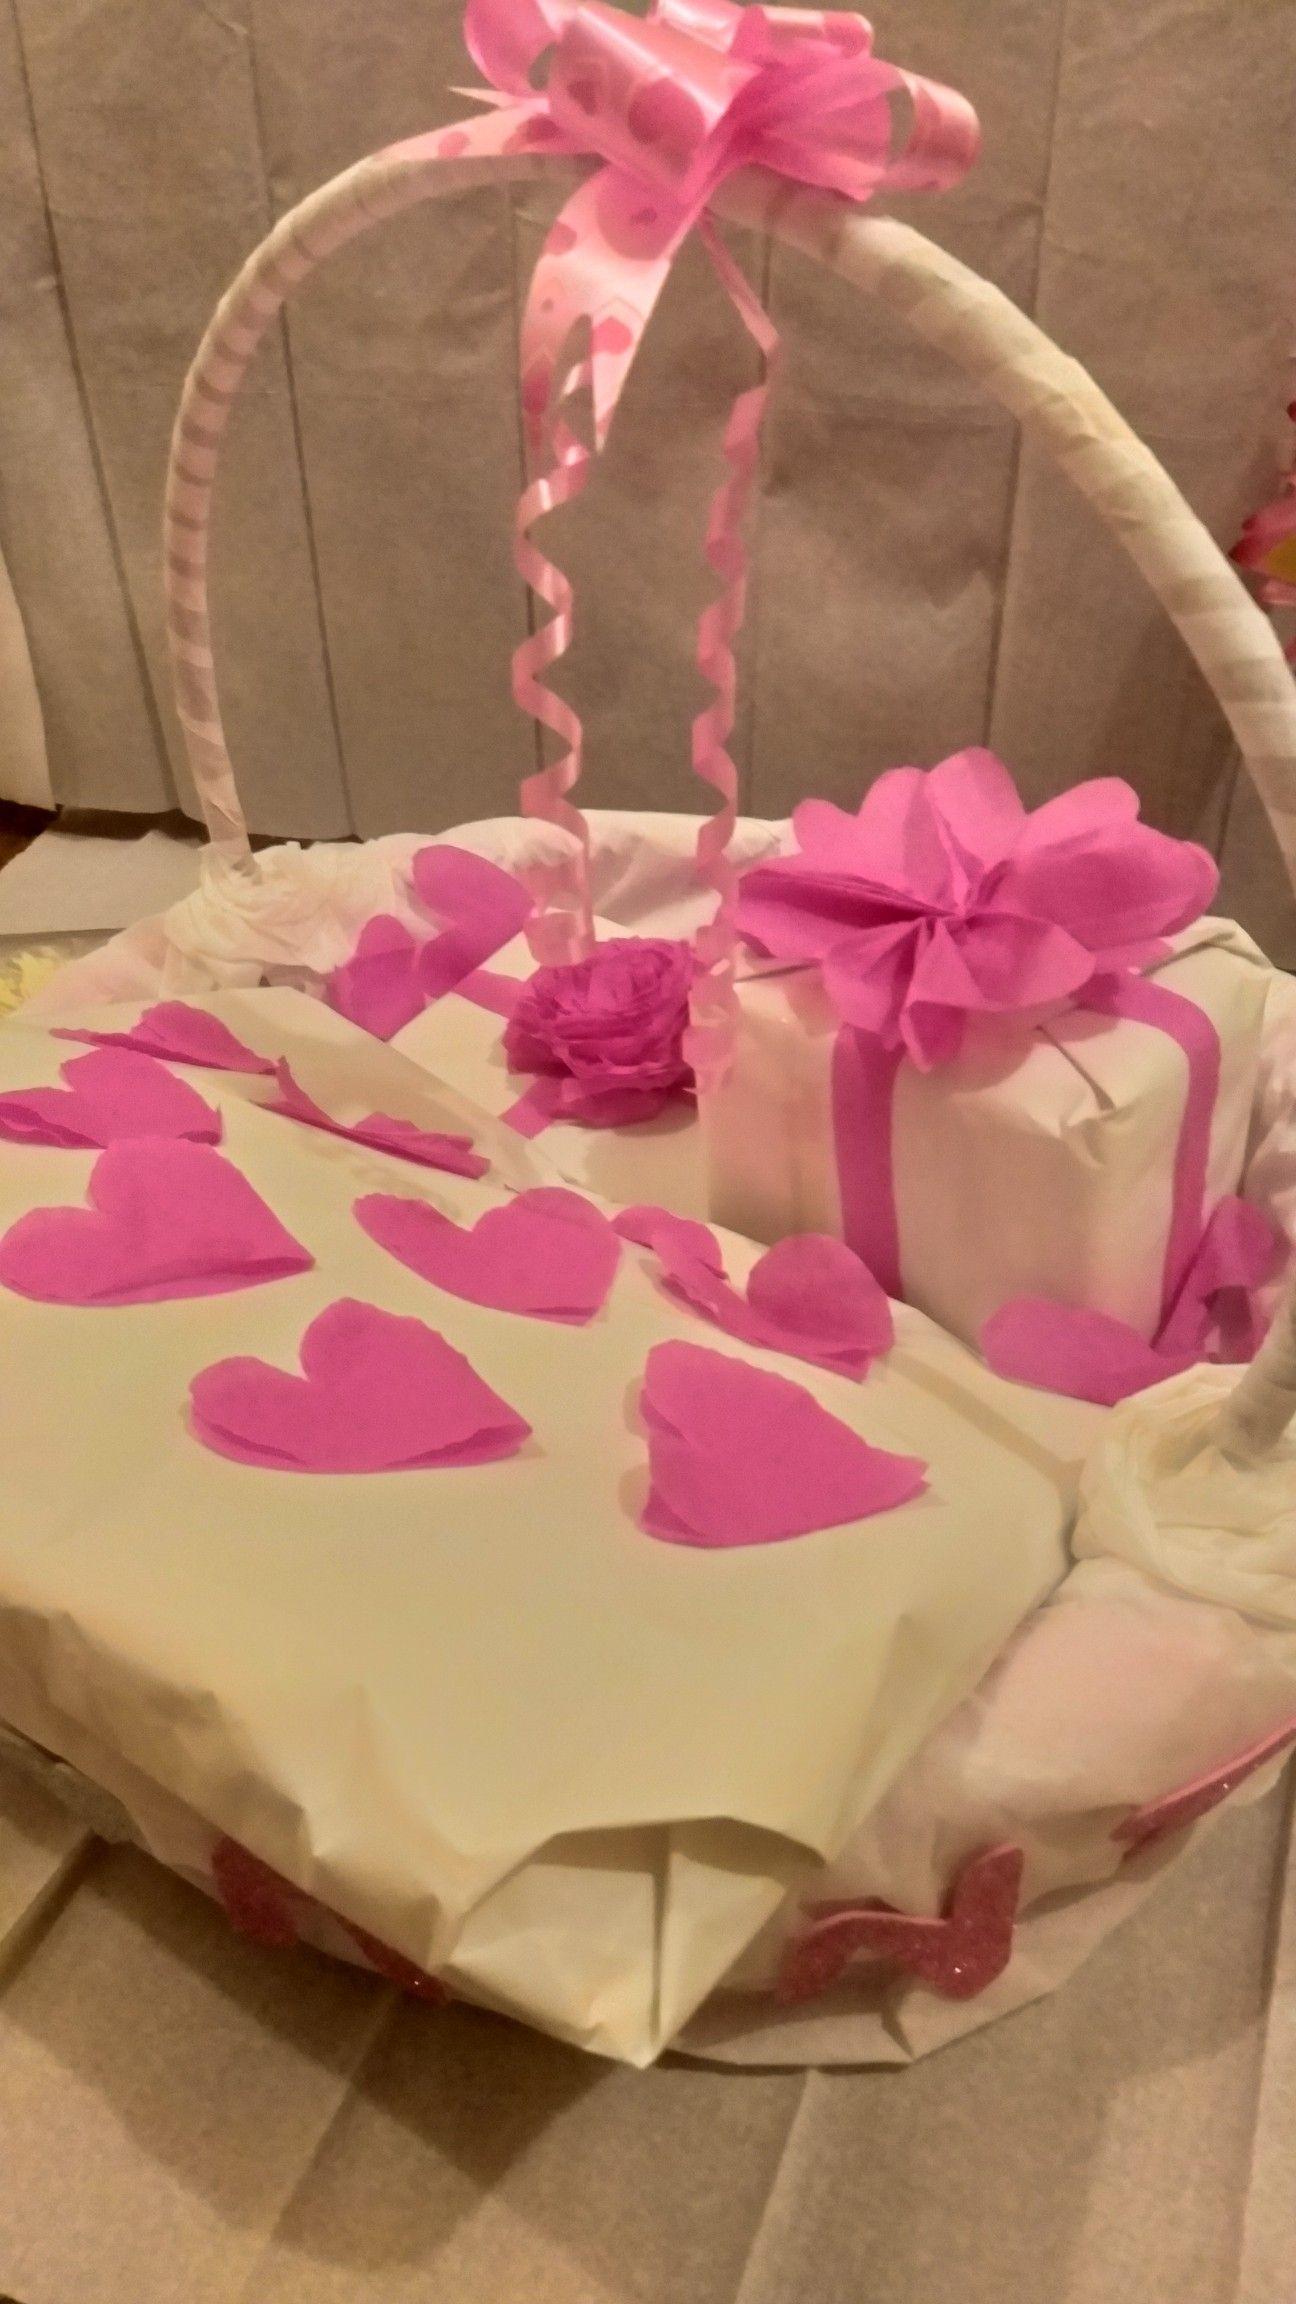 Gift wrappingbasketdiywhitepink birthday wrapping